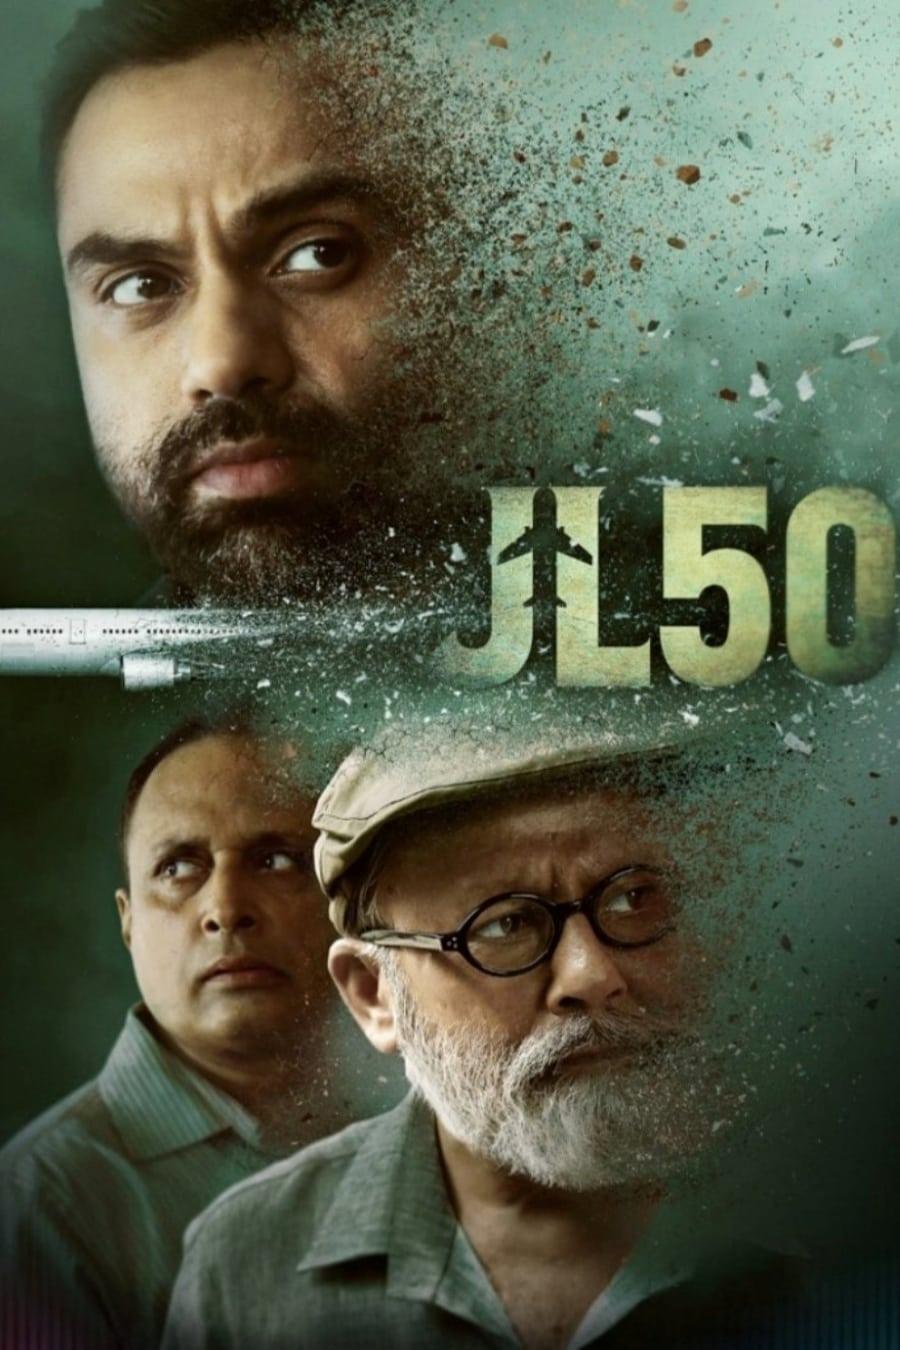 JL50 S01 [Episode 1-4] 1080p WEB-Rip [430 MB/ep] 720p WEB-Rip [220 MB/ep] DD 2.0 | G-Drive